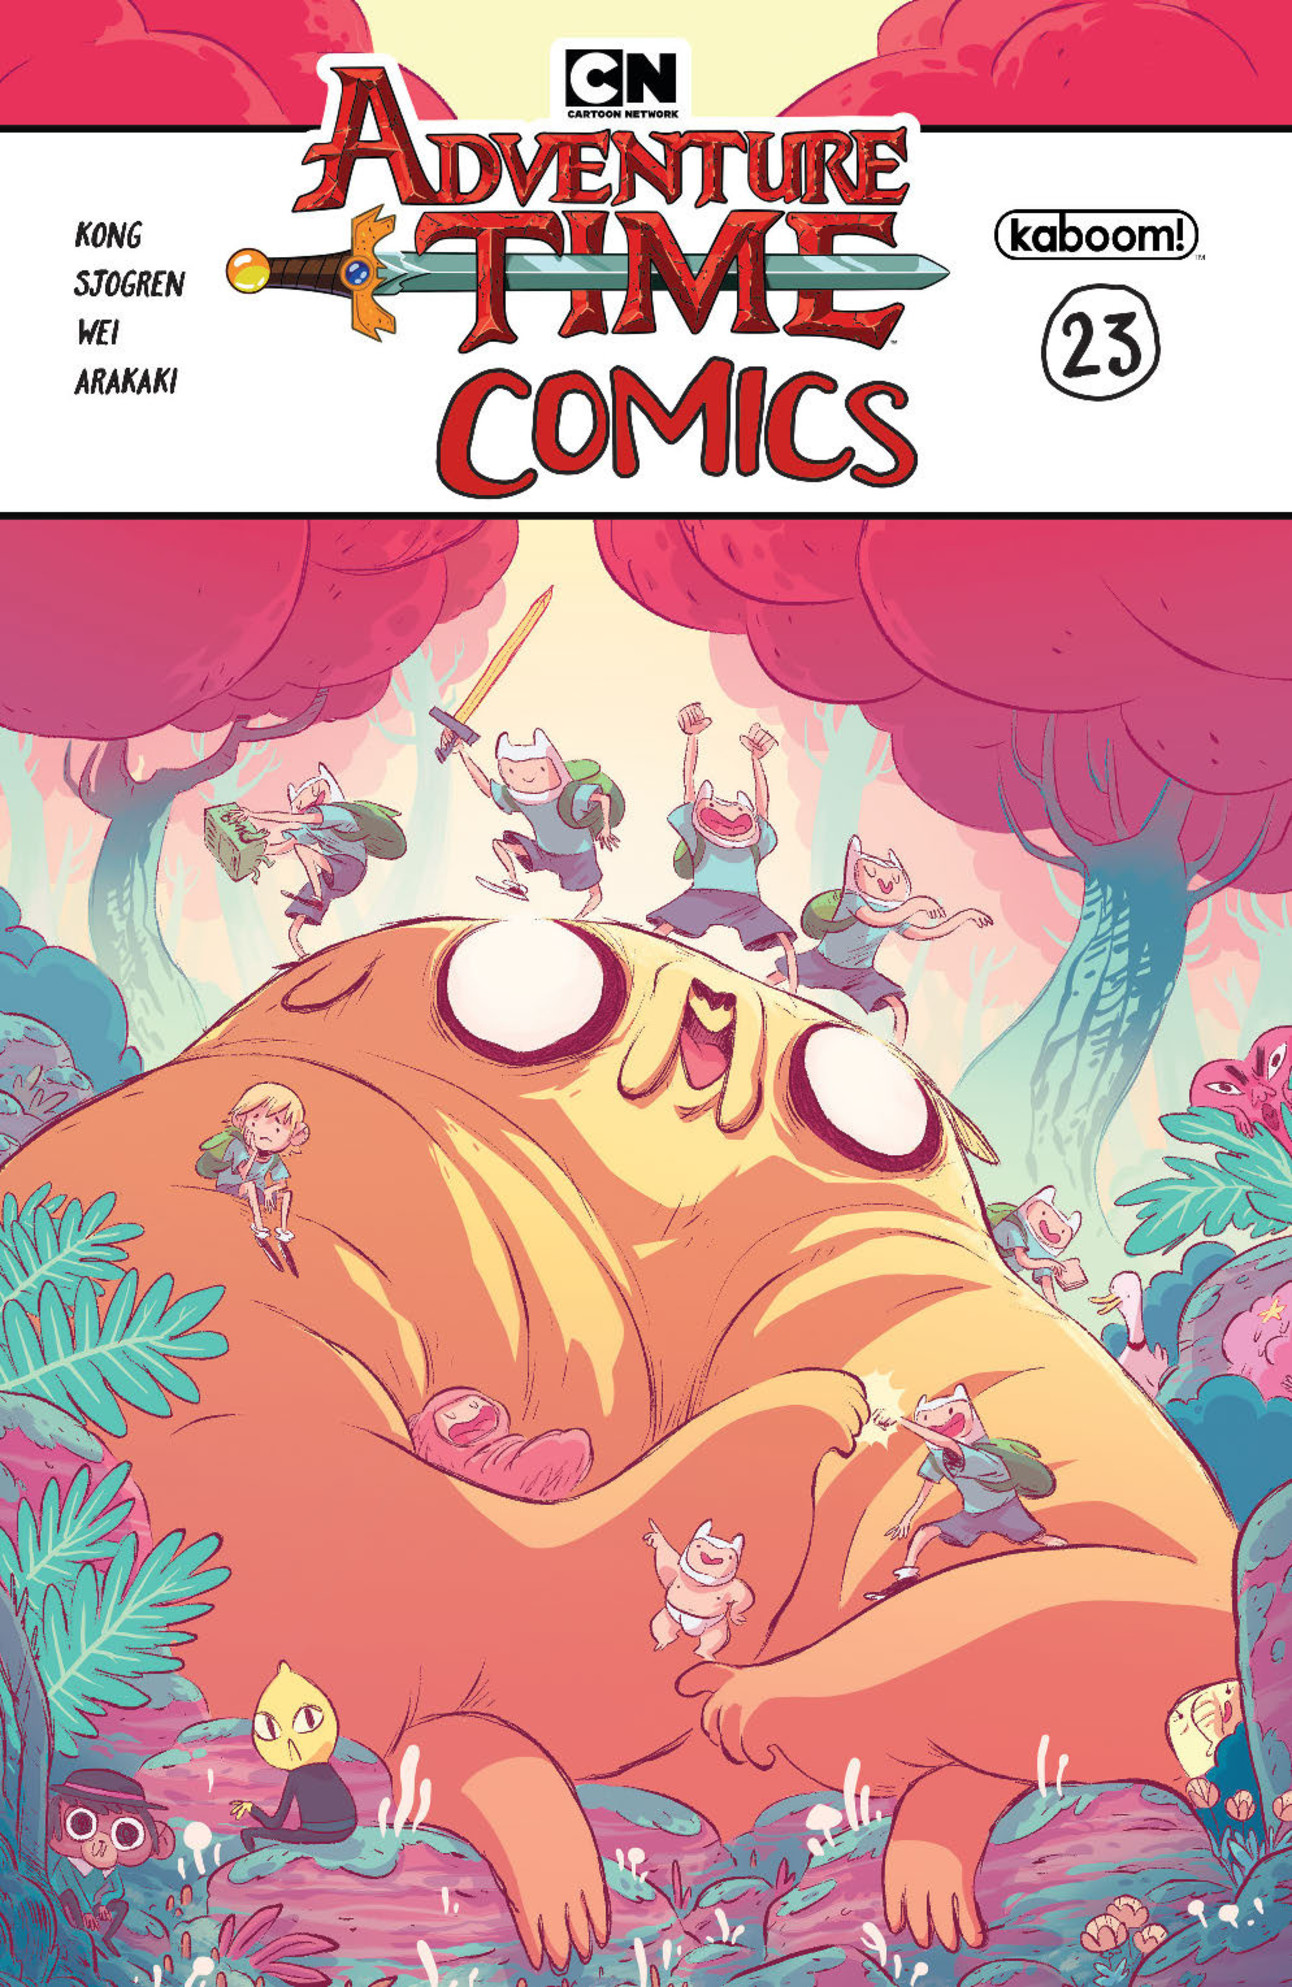 boom_adventure_time_comics_23_cover.jpg